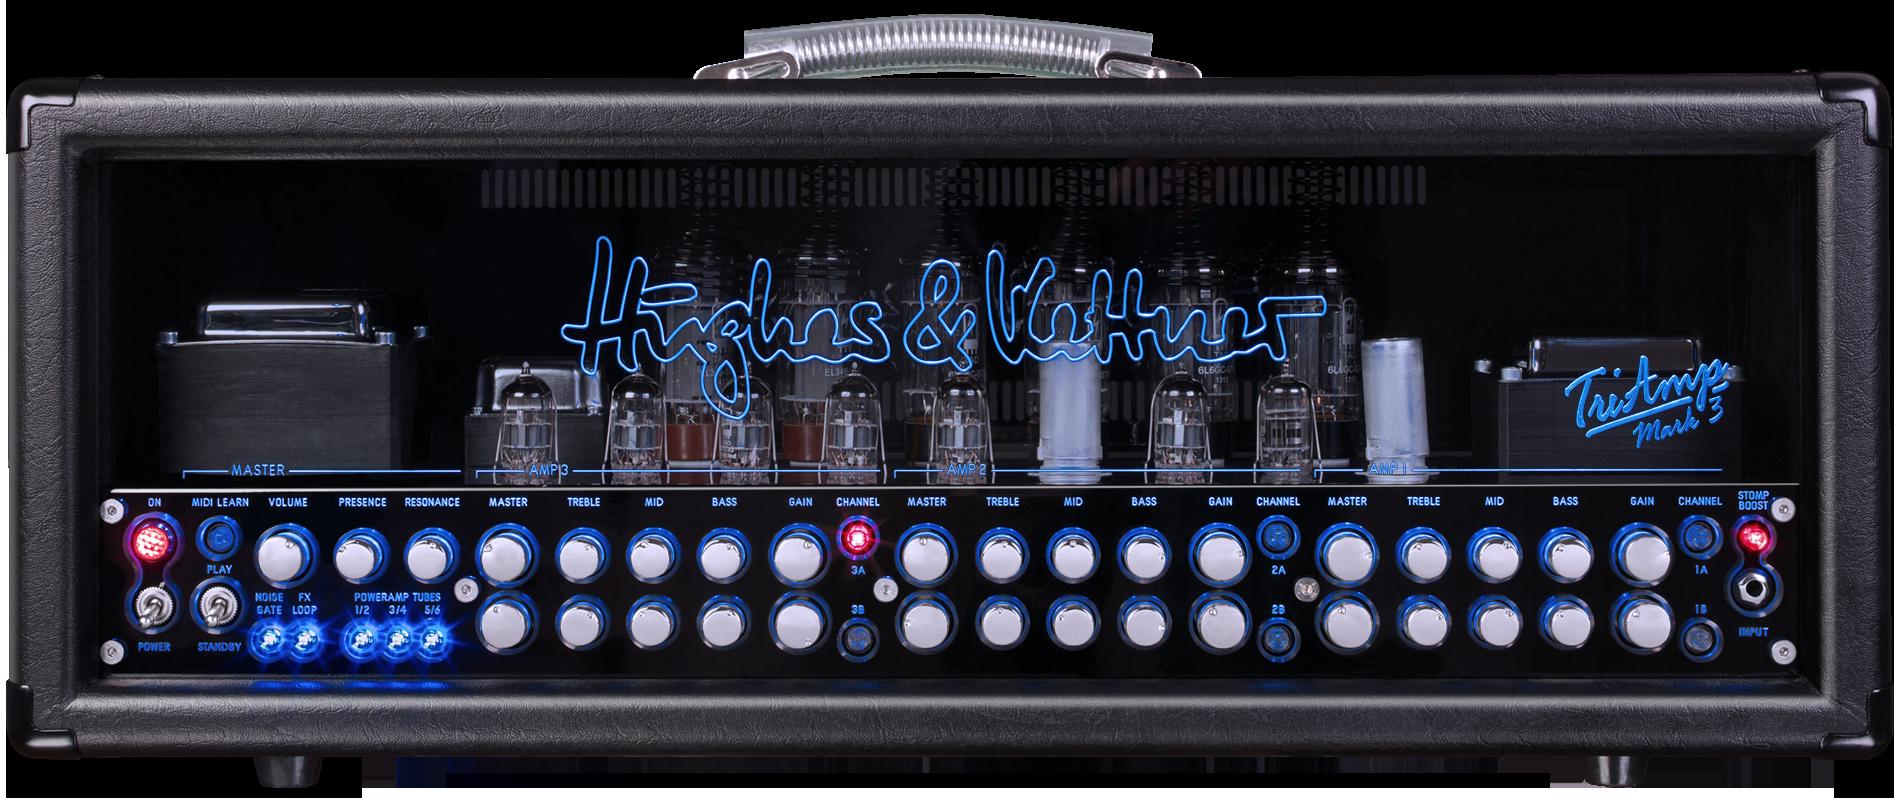 Audiofanzine video on the Hughes & Kettner TriAmp Mark 3